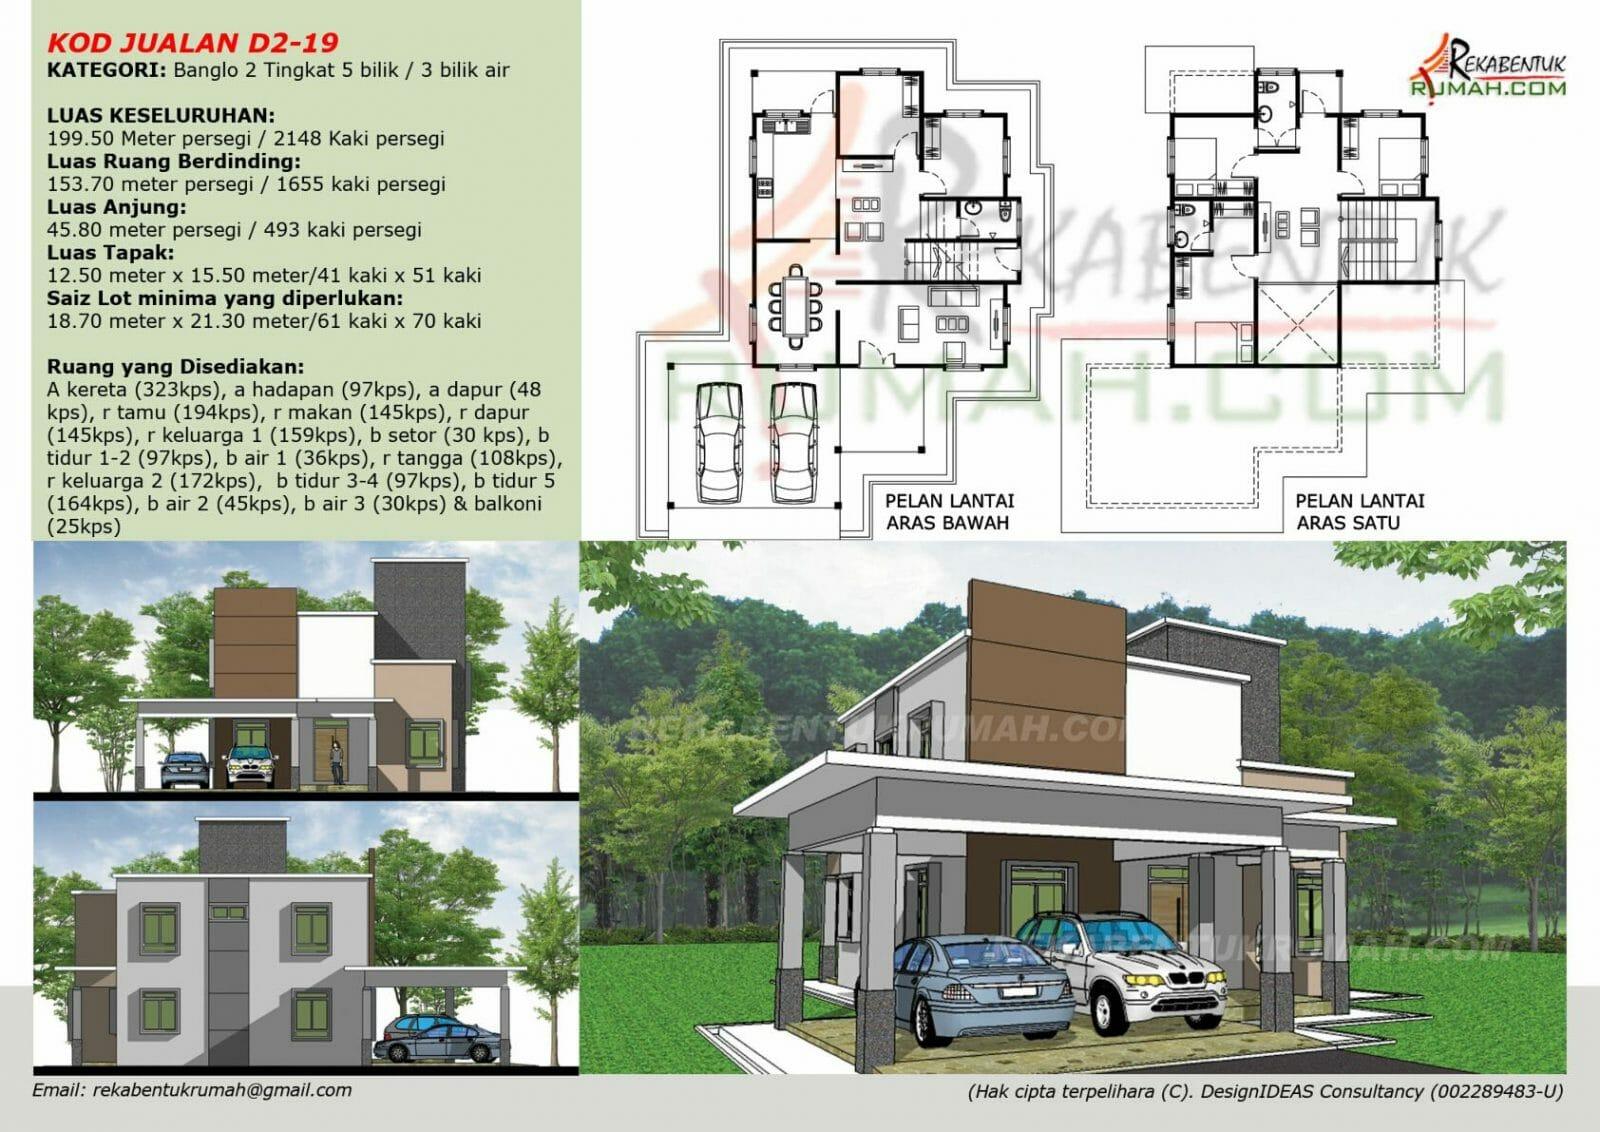 Home Grid 4